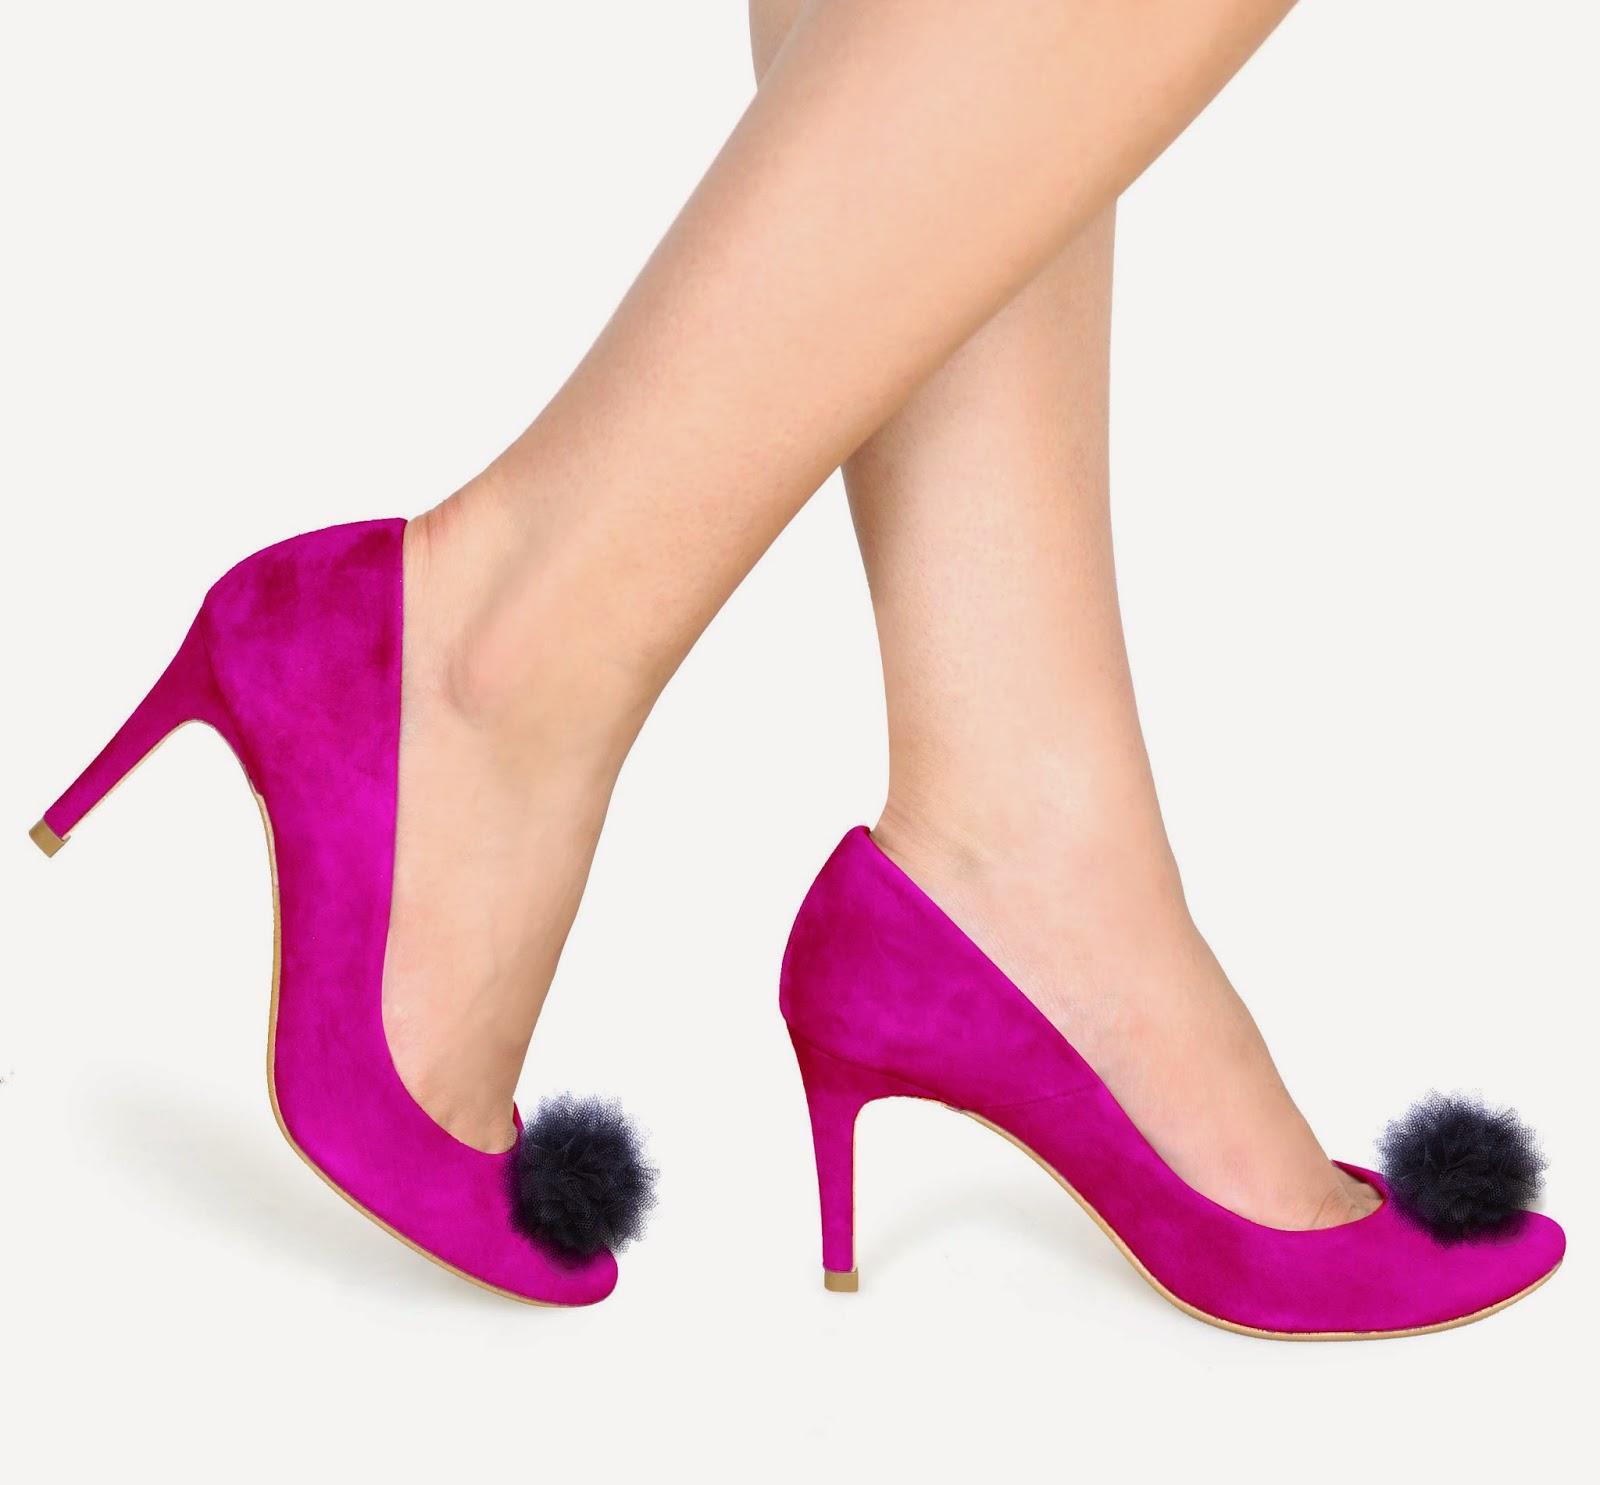 Bylarin-elblogdepatricia-shoes-zapatos-scarpe-calzature-calzado.